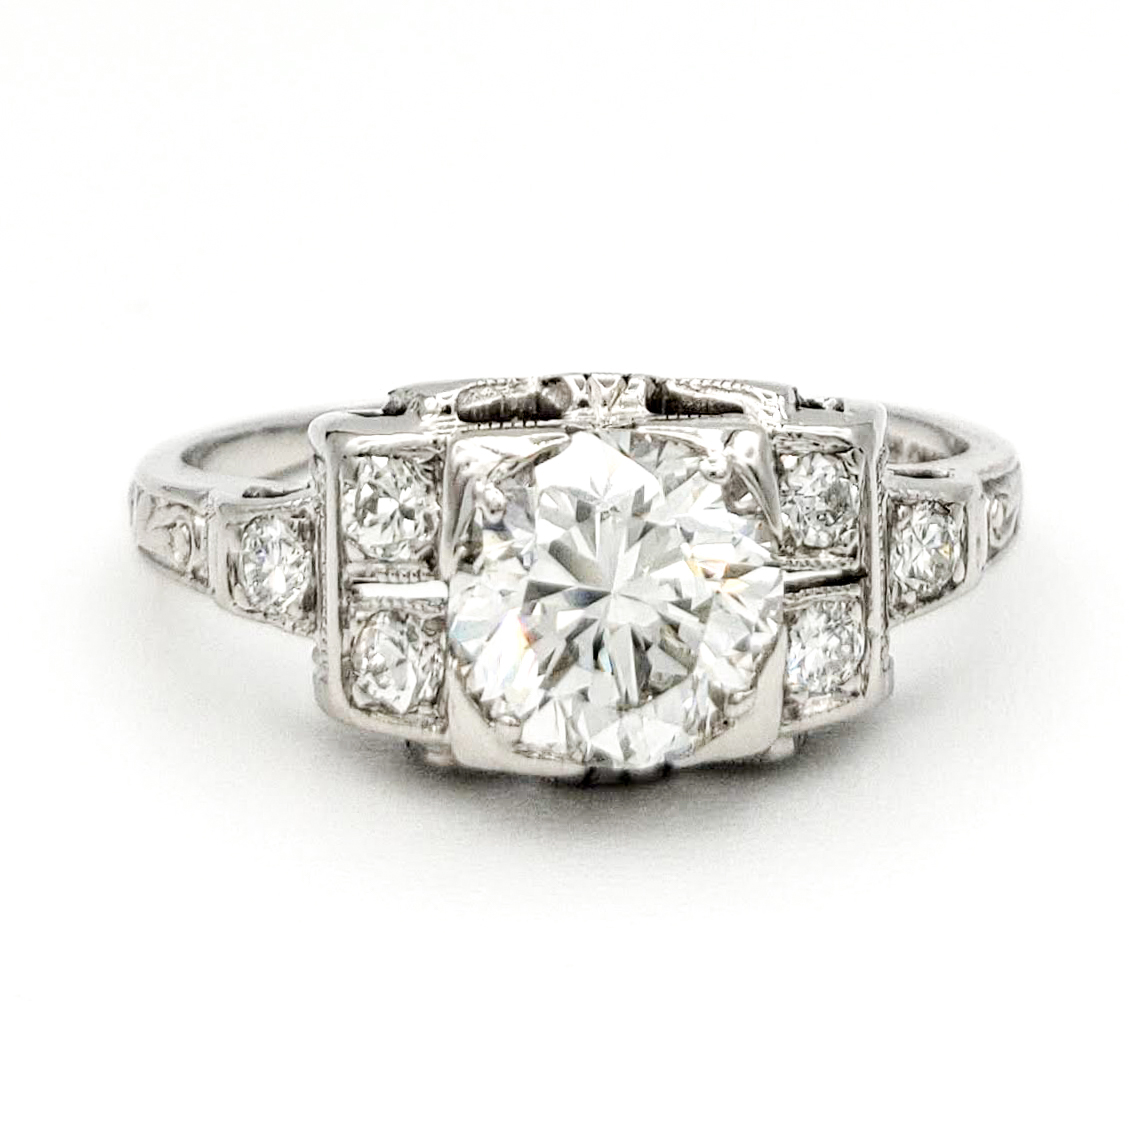 vintage-platinum-engagement-ring-with-0-74-carat-old-european-cut-diamond-egl-h-vs1